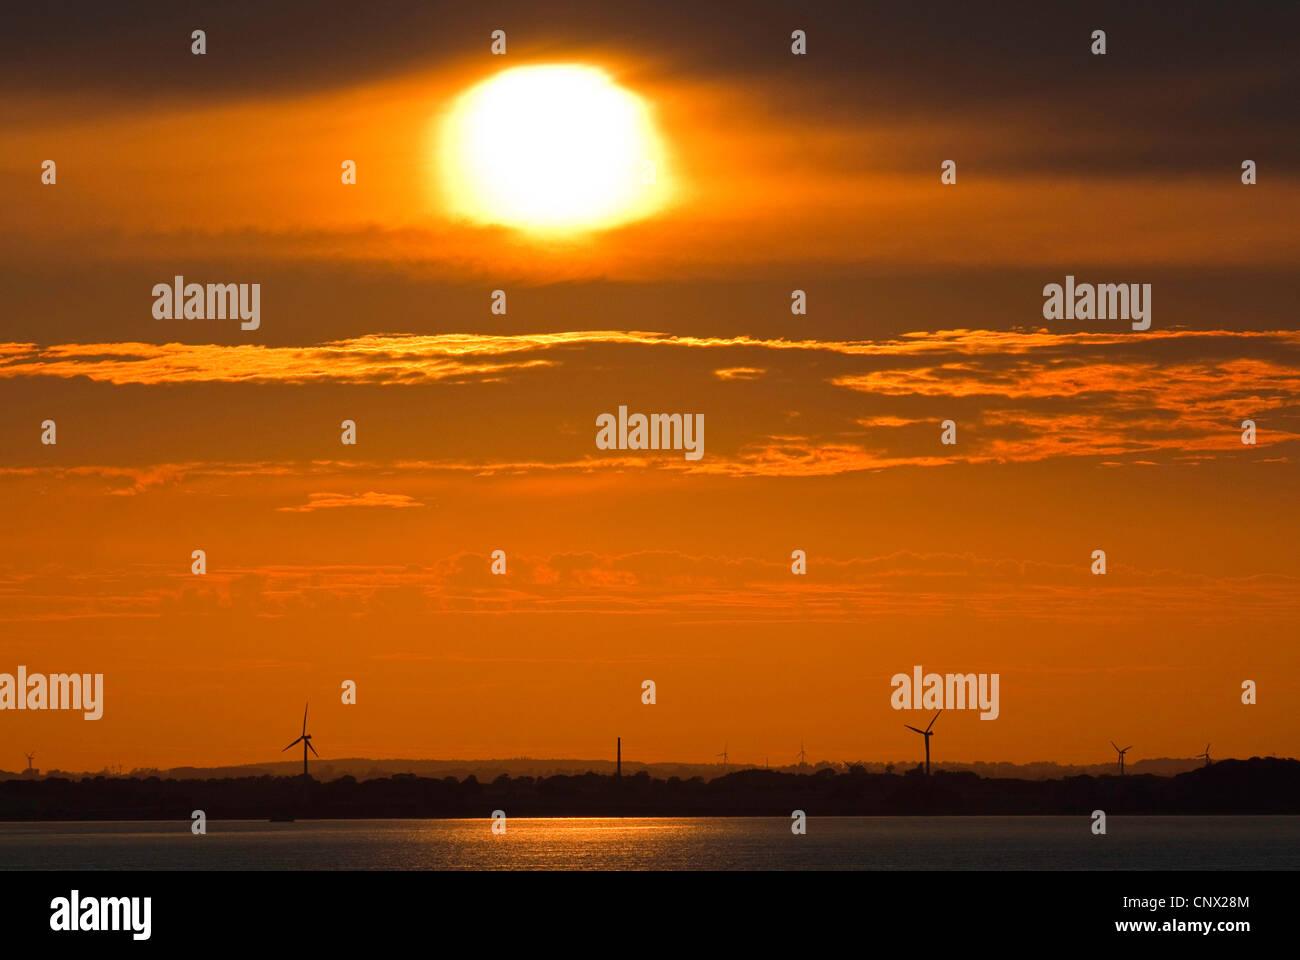 coastline at the Little Belt at sunset with silhouettes of wind wheels, Denmark, Kleiner Belt Stock Photo